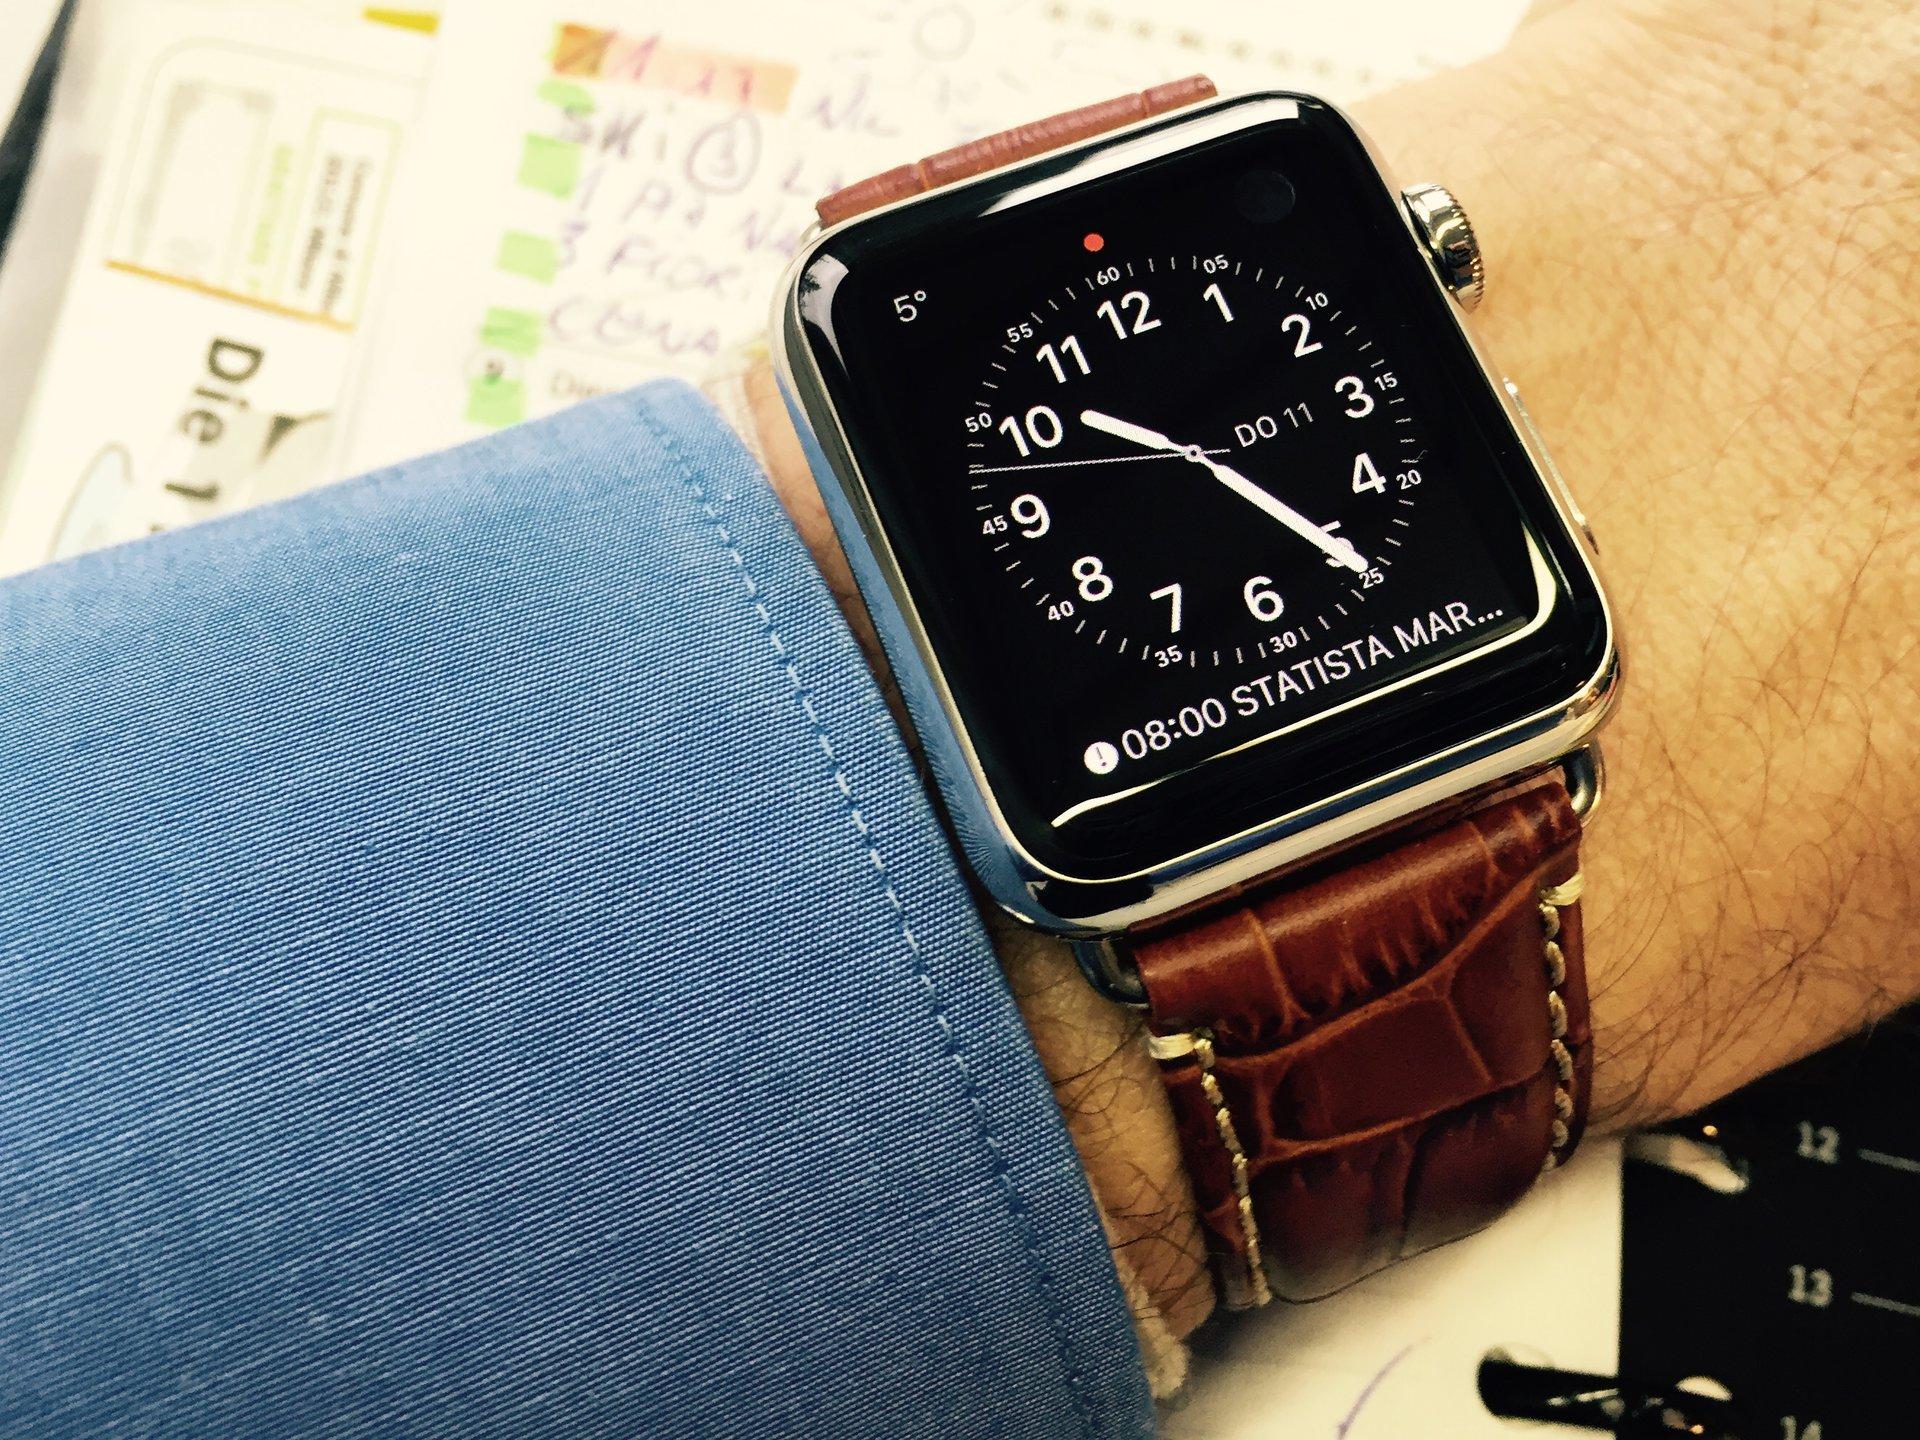 erledigt apple watch edelstahl 38 mm komplett mit rechnung und lederarmband uhrforum. Black Bedroom Furniture Sets. Home Design Ideas